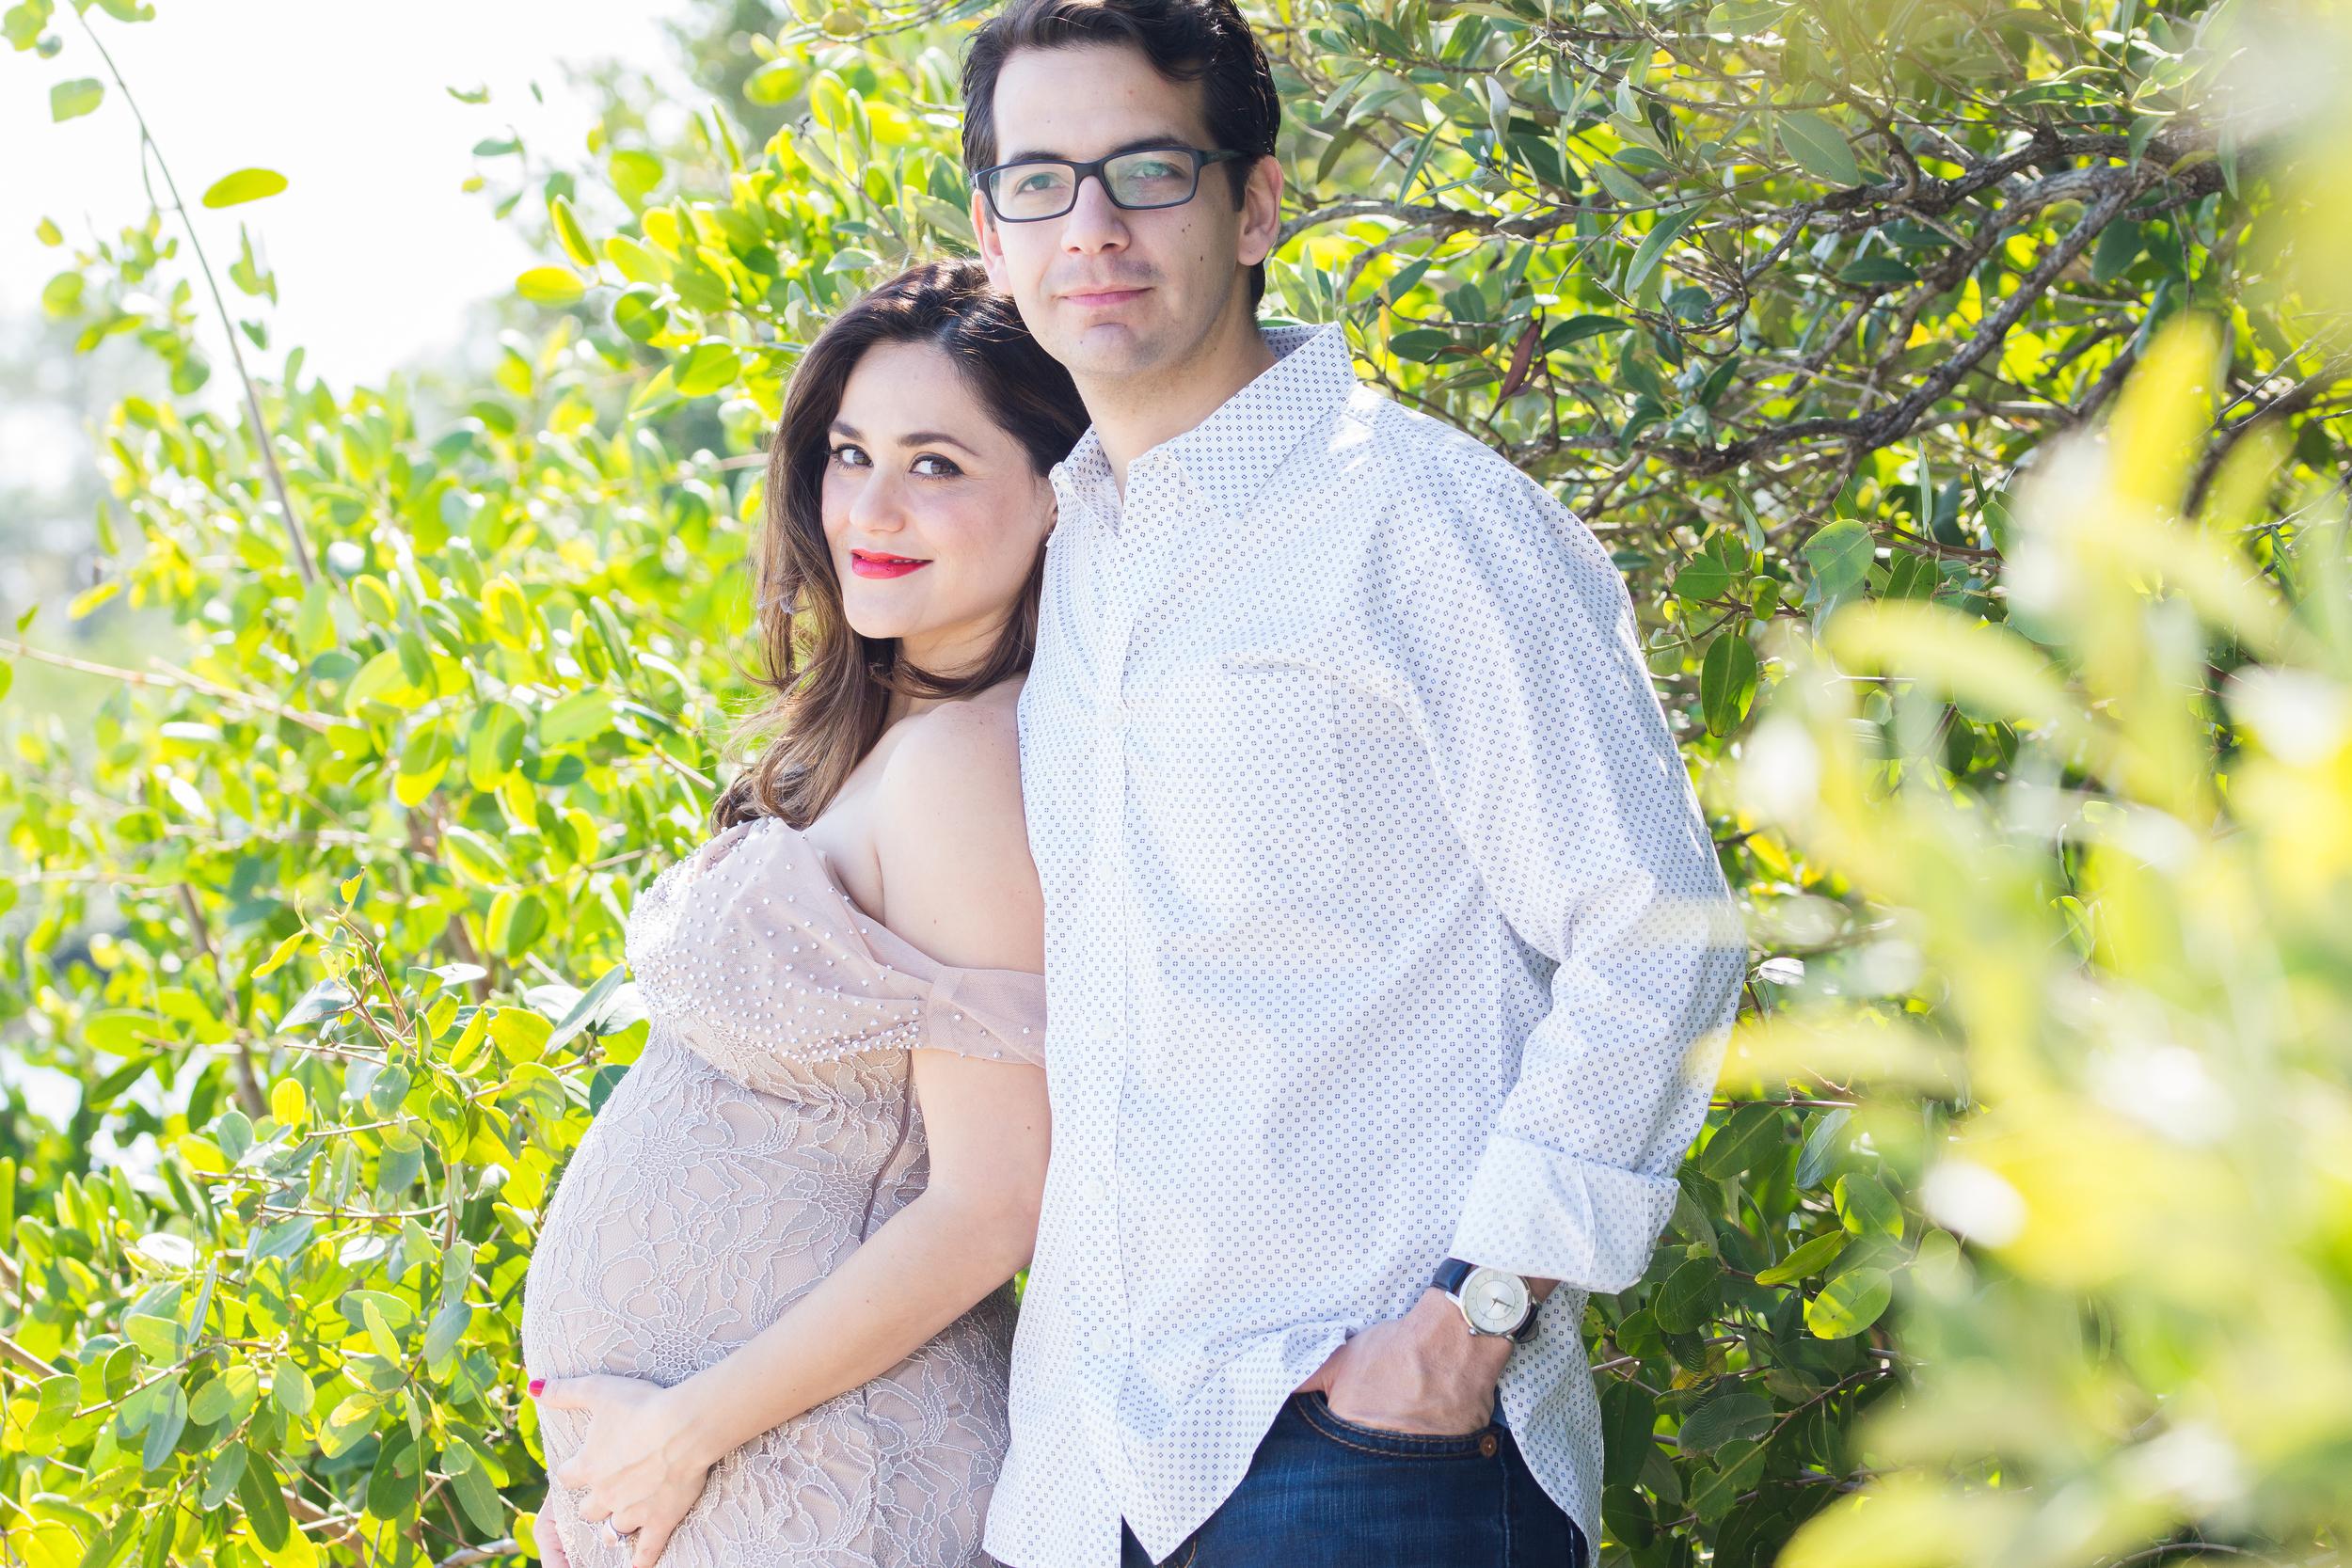 Phillipe Park Maternity session